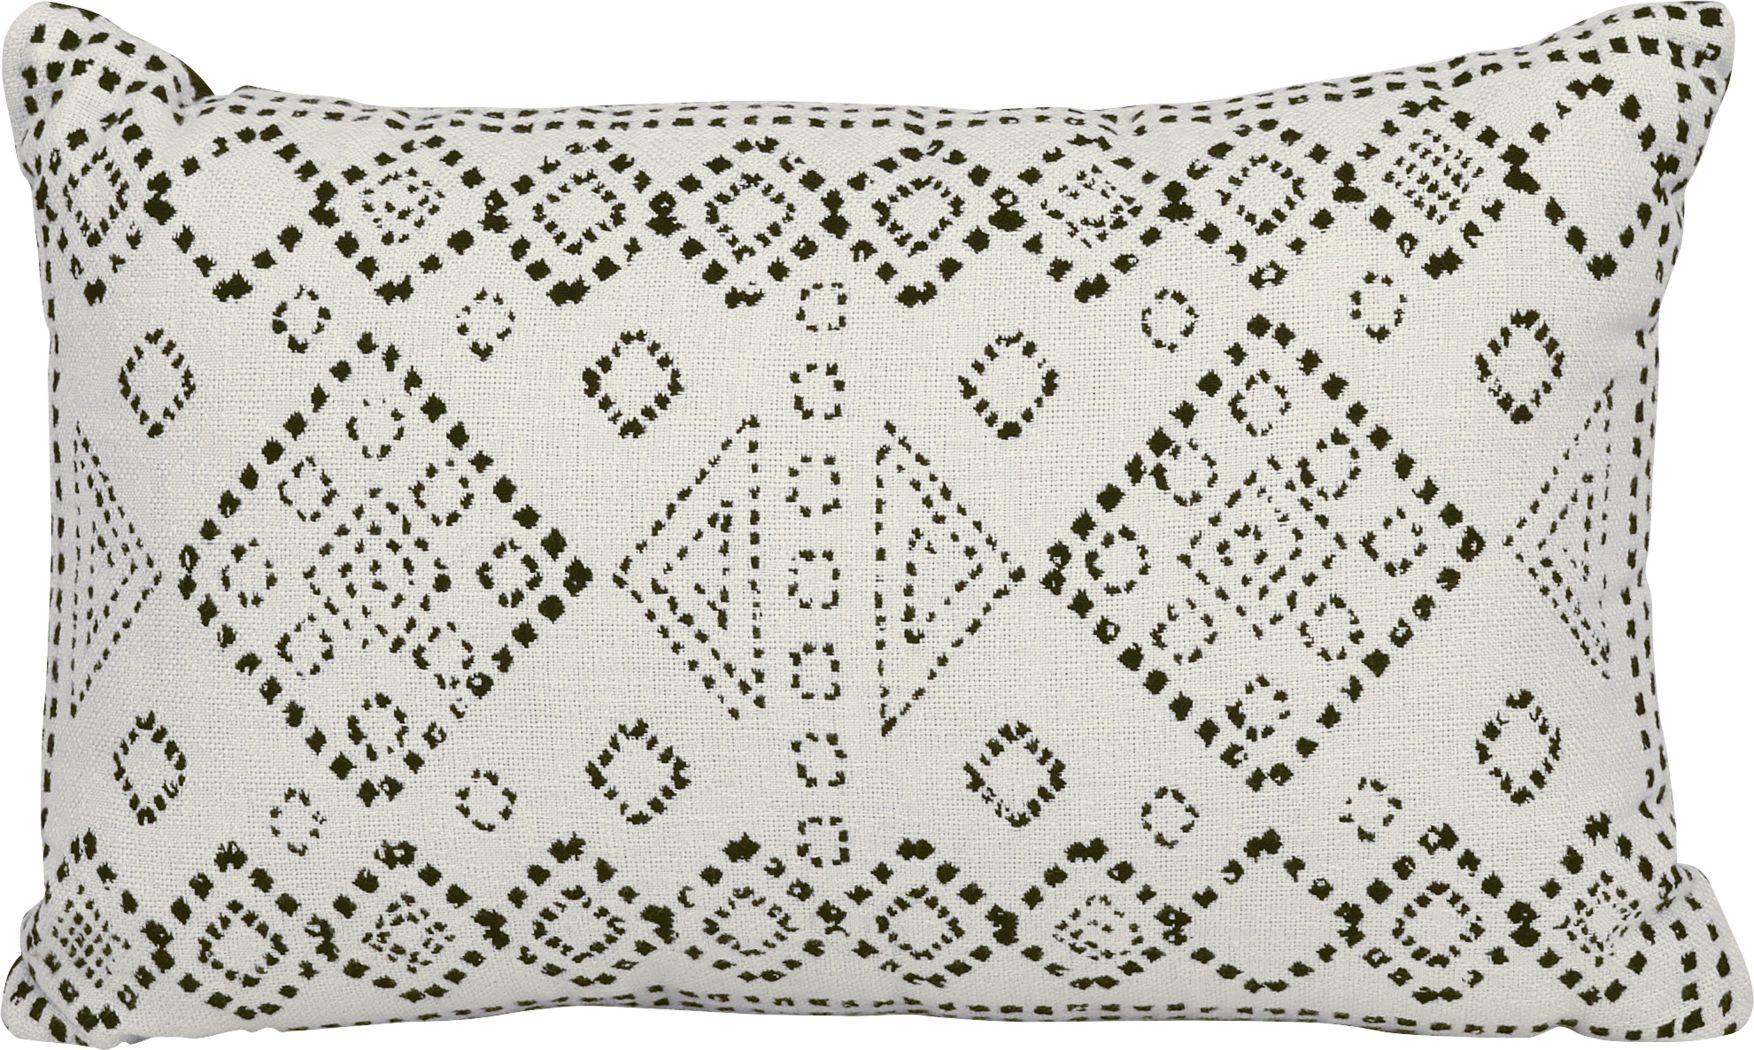 Kilim Stitch White Indoor/Outdoor Accent Pillow